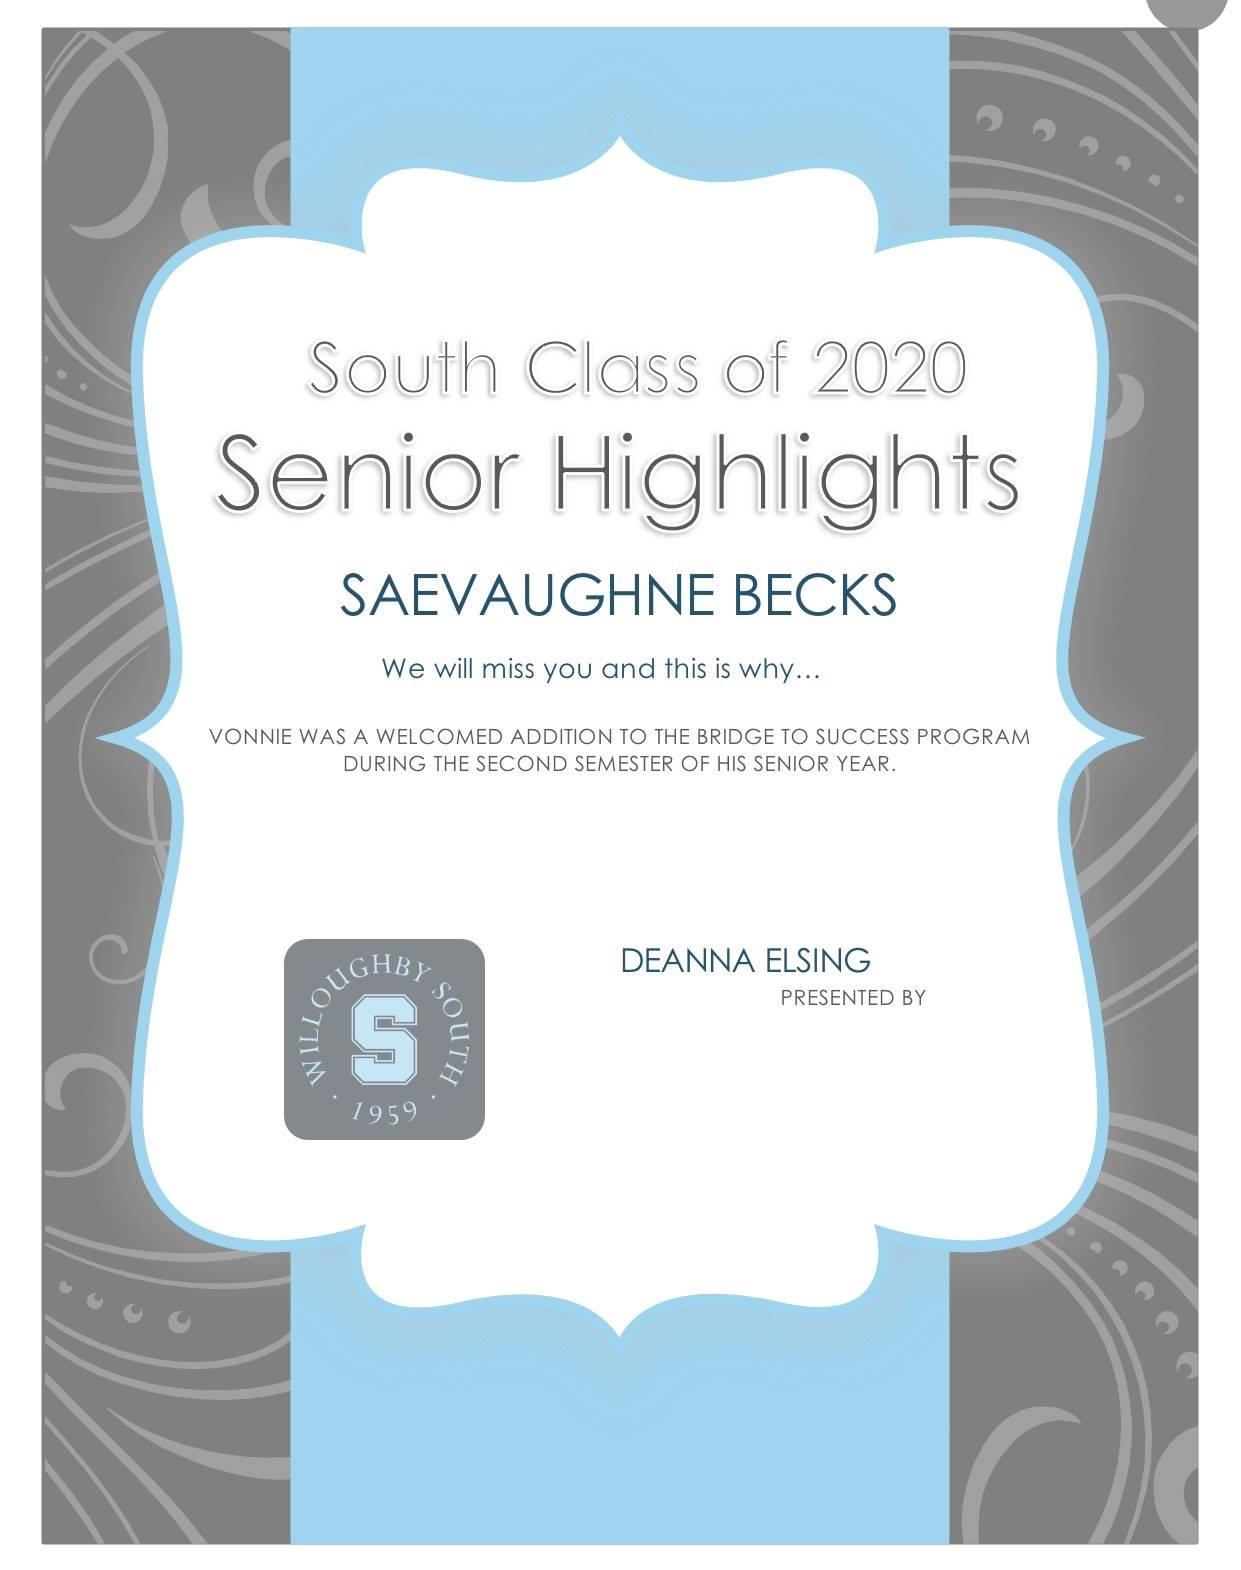 Saevaughne Becks